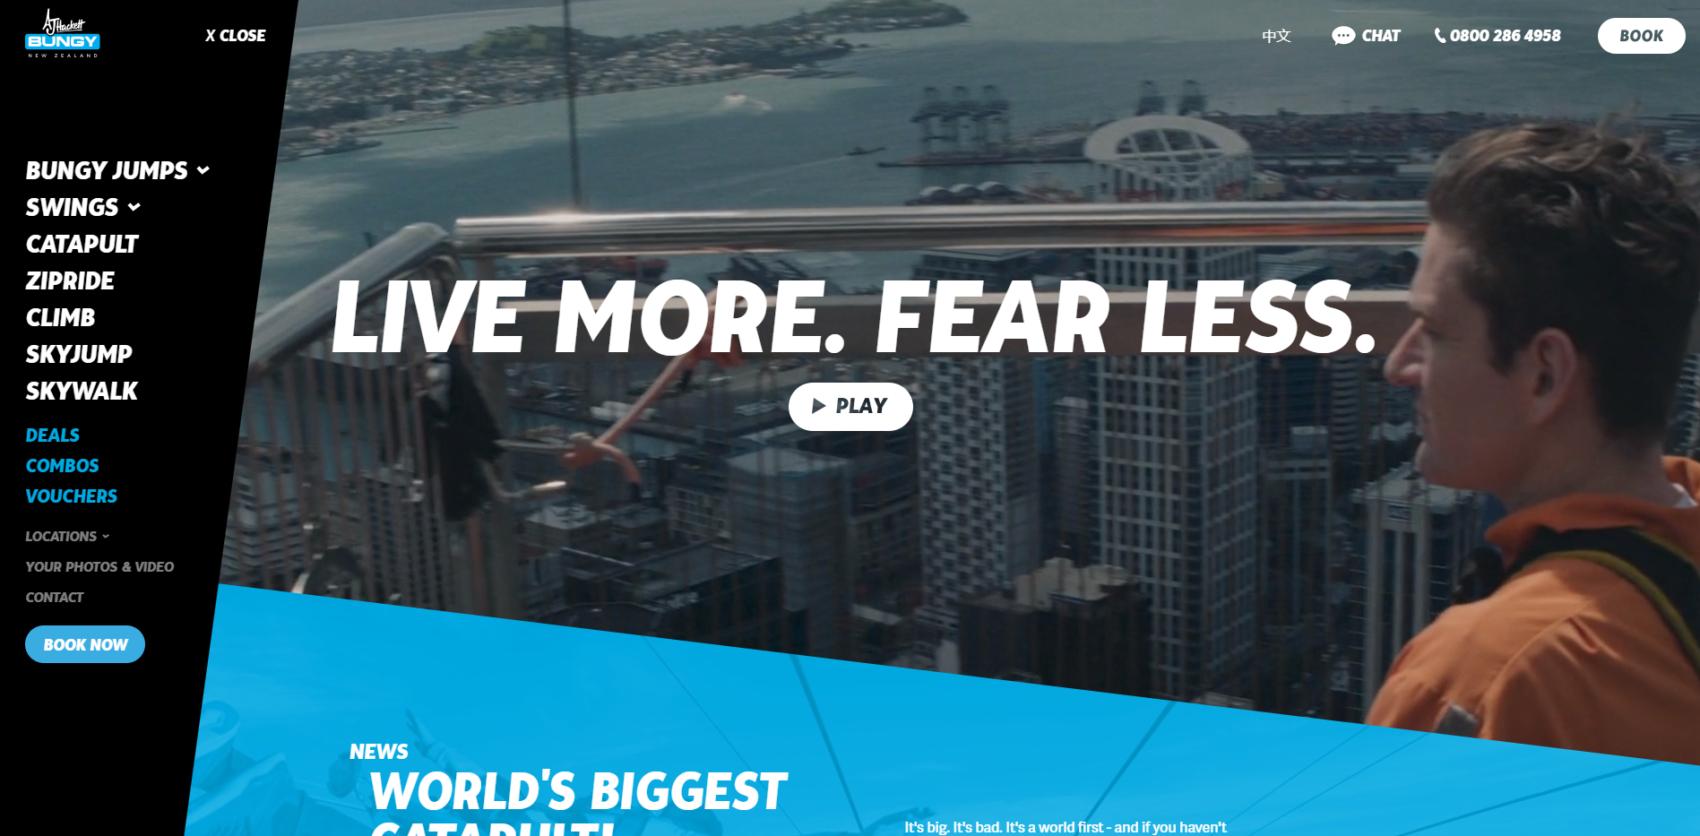 Extreme Sports Company